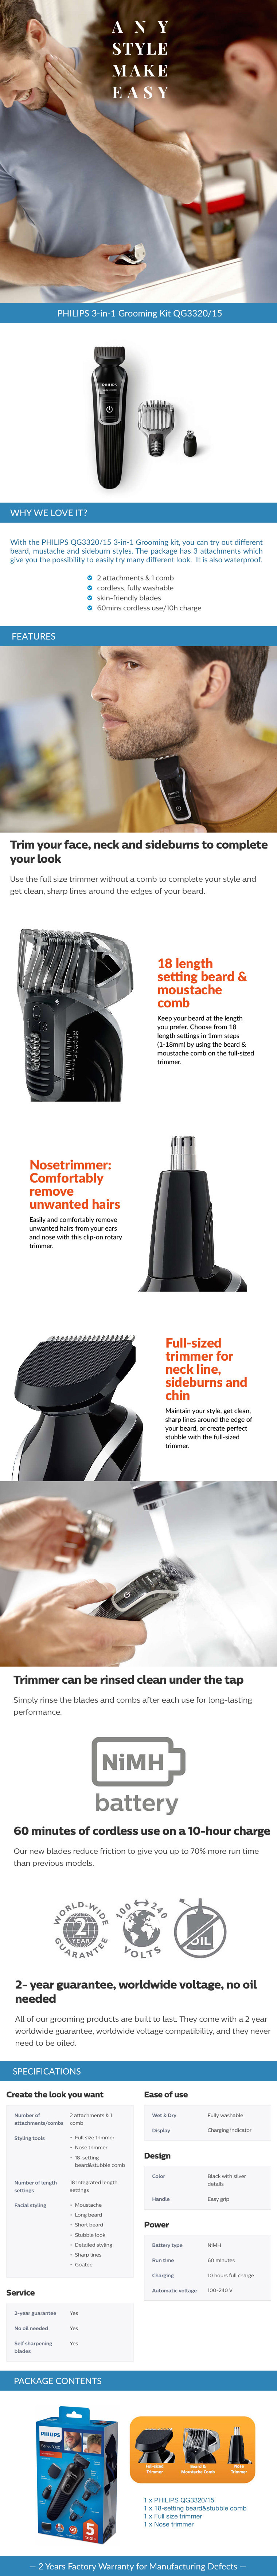 philips 3 in 1 grooming kit qg3320 15 go shop. Black Bedroom Furniture Sets. Home Design Ideas